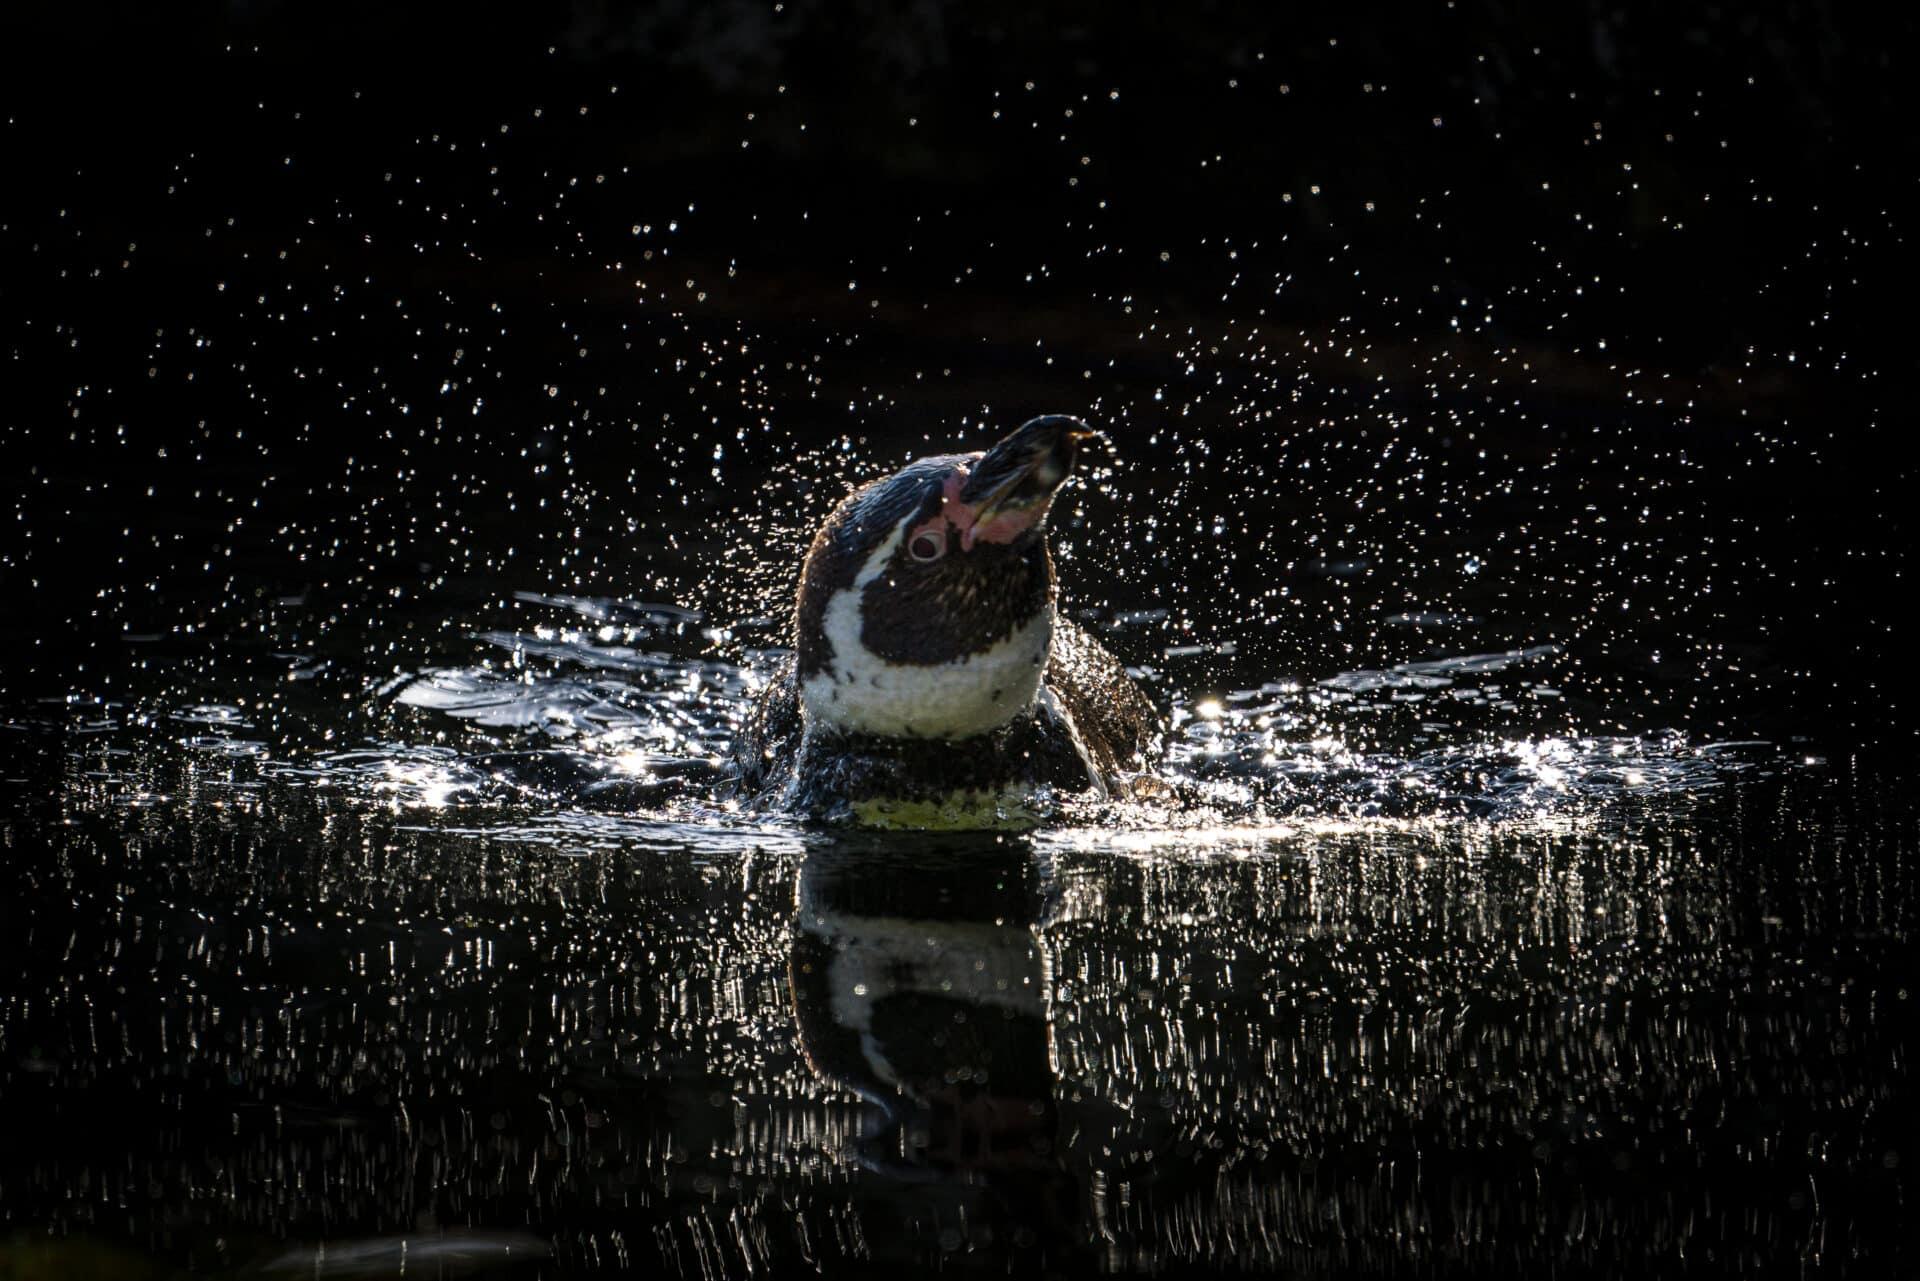 Humbolt Penguin Spheniscus Humboldti Marwell Zoo Jason Brown 1